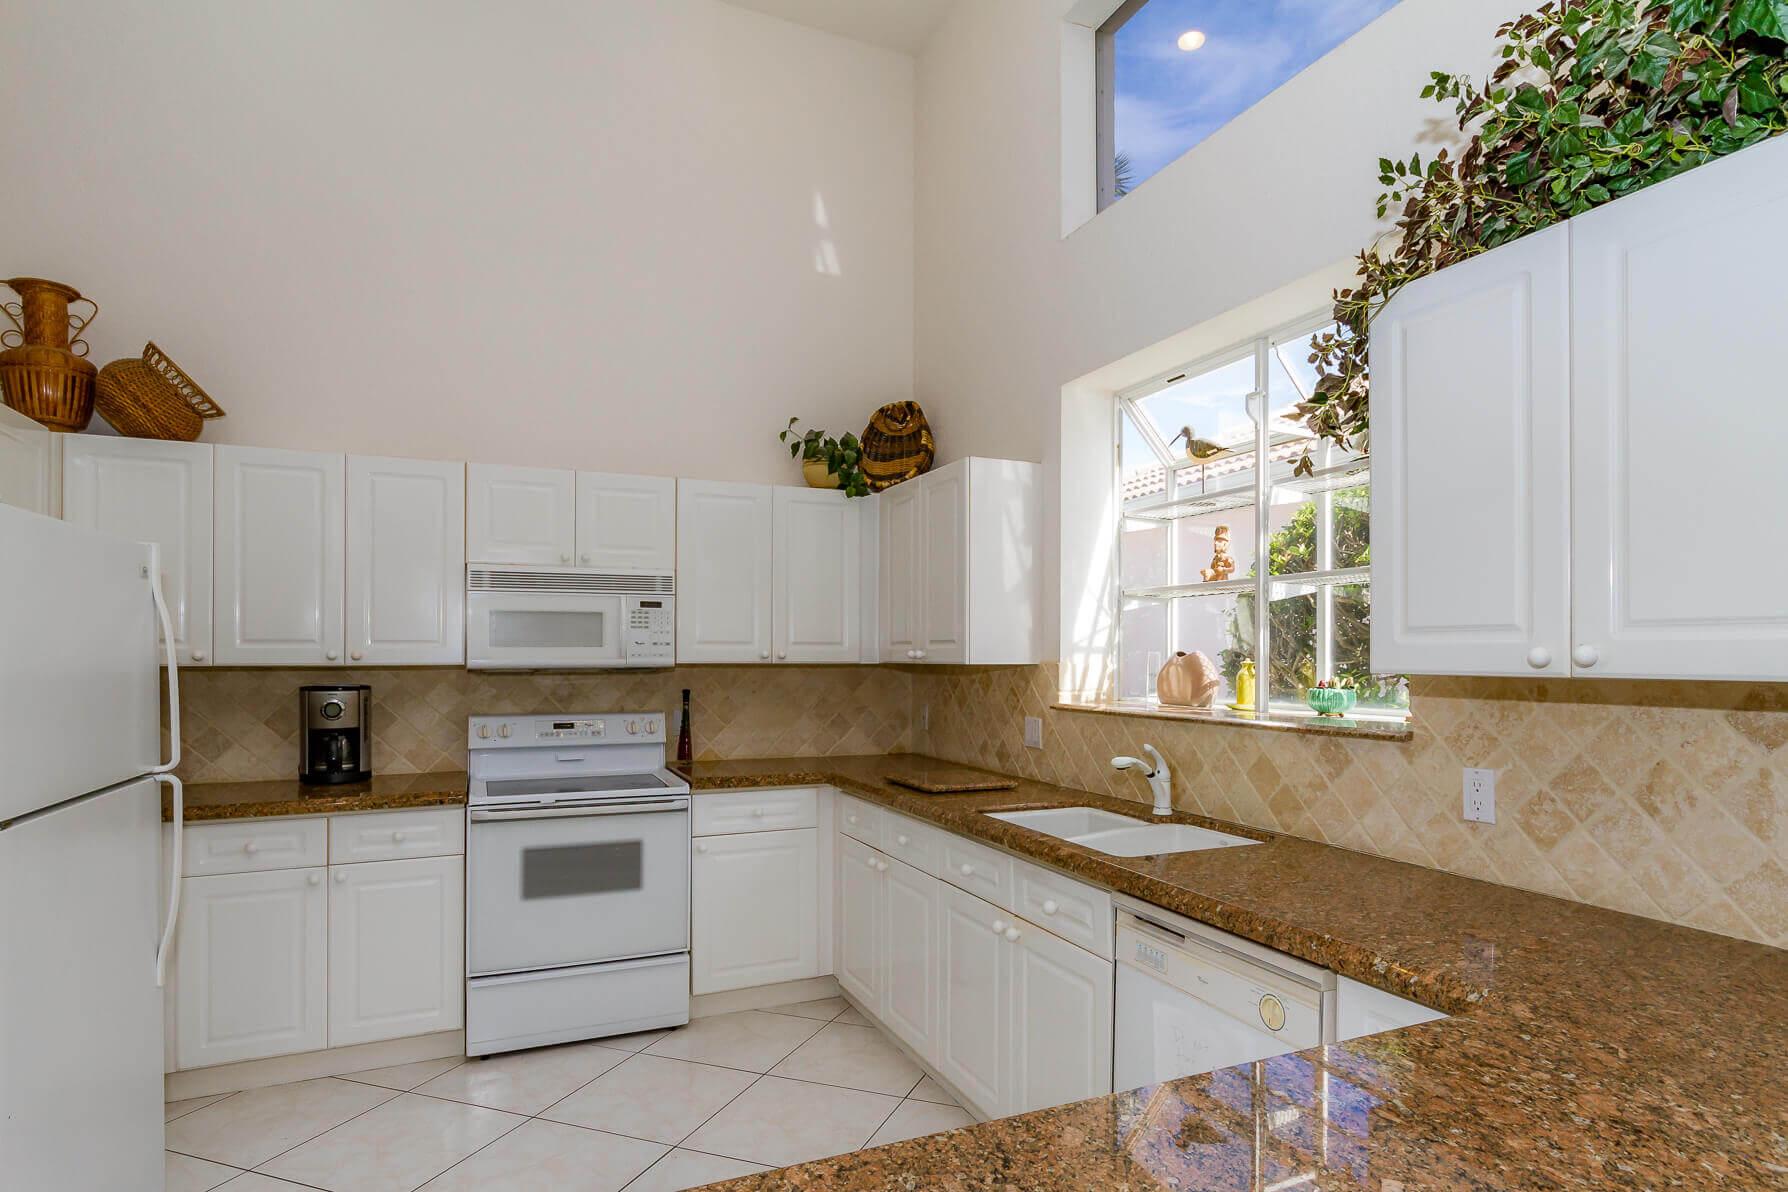 Real Estate Photography Broward County